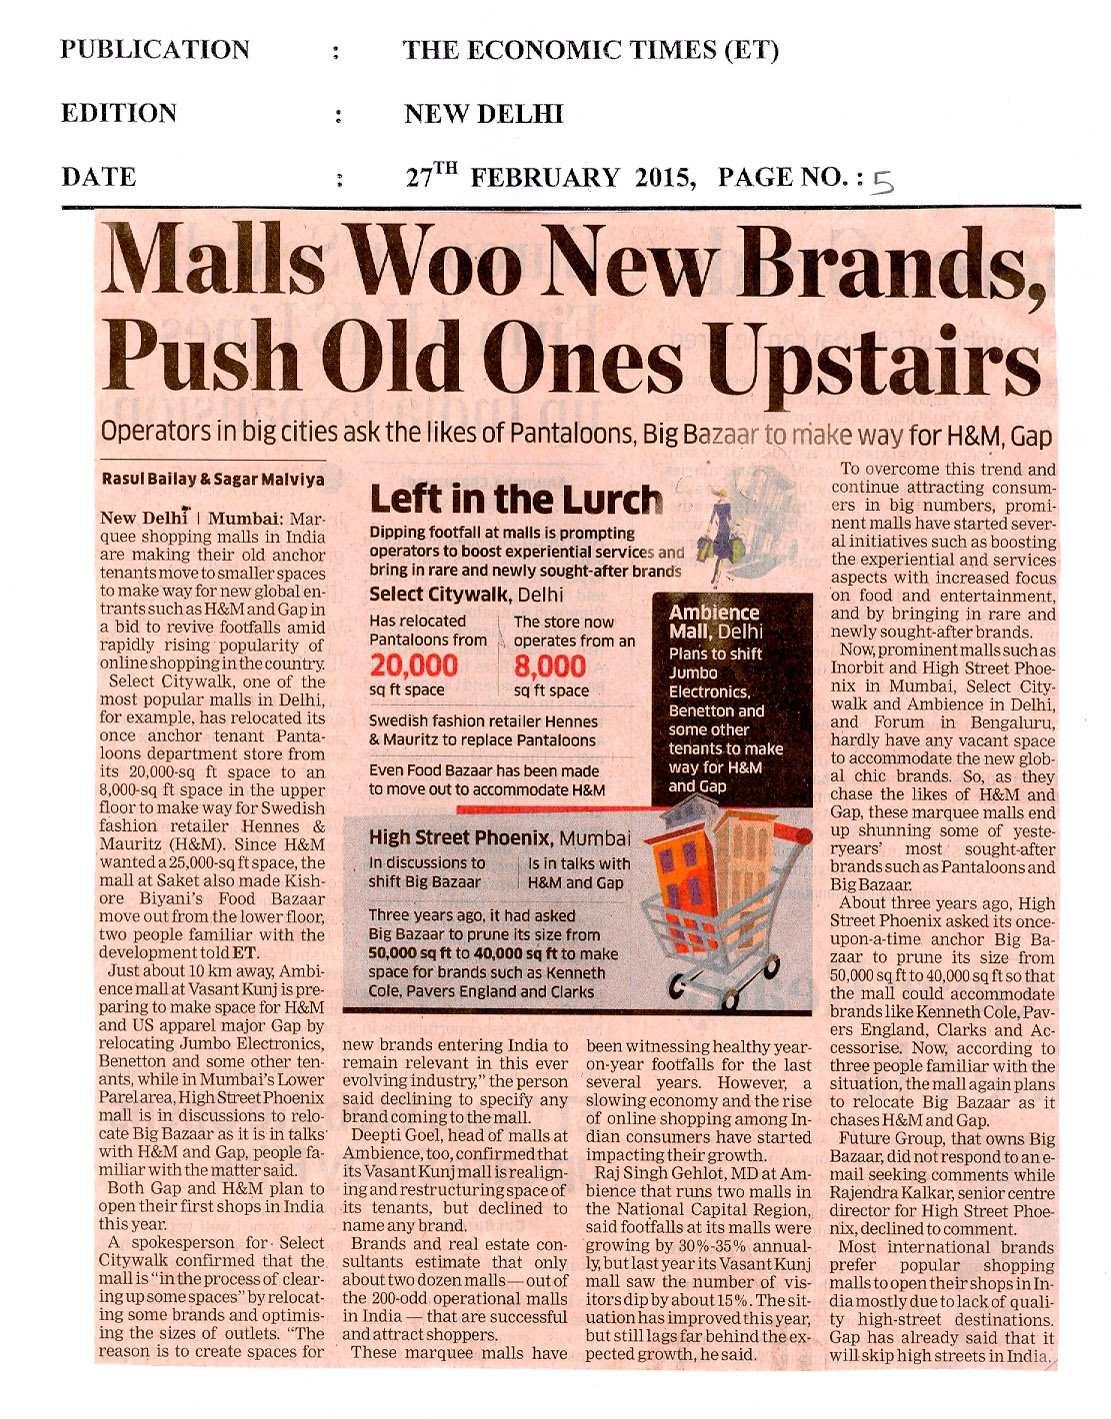 Malls Woo New Brands